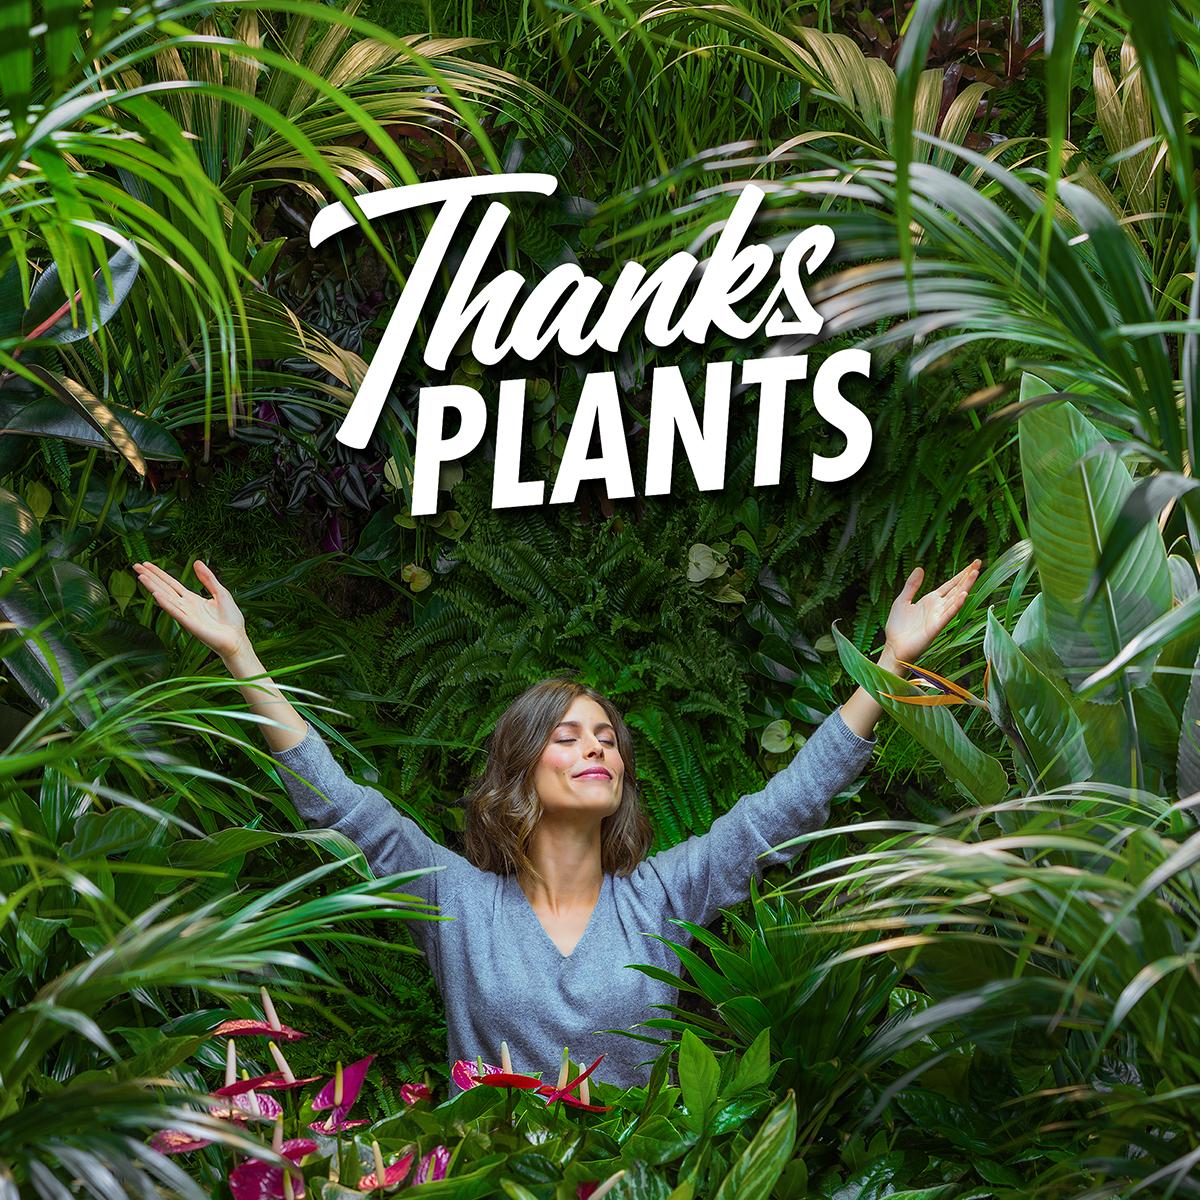 Thanks Plant campaign